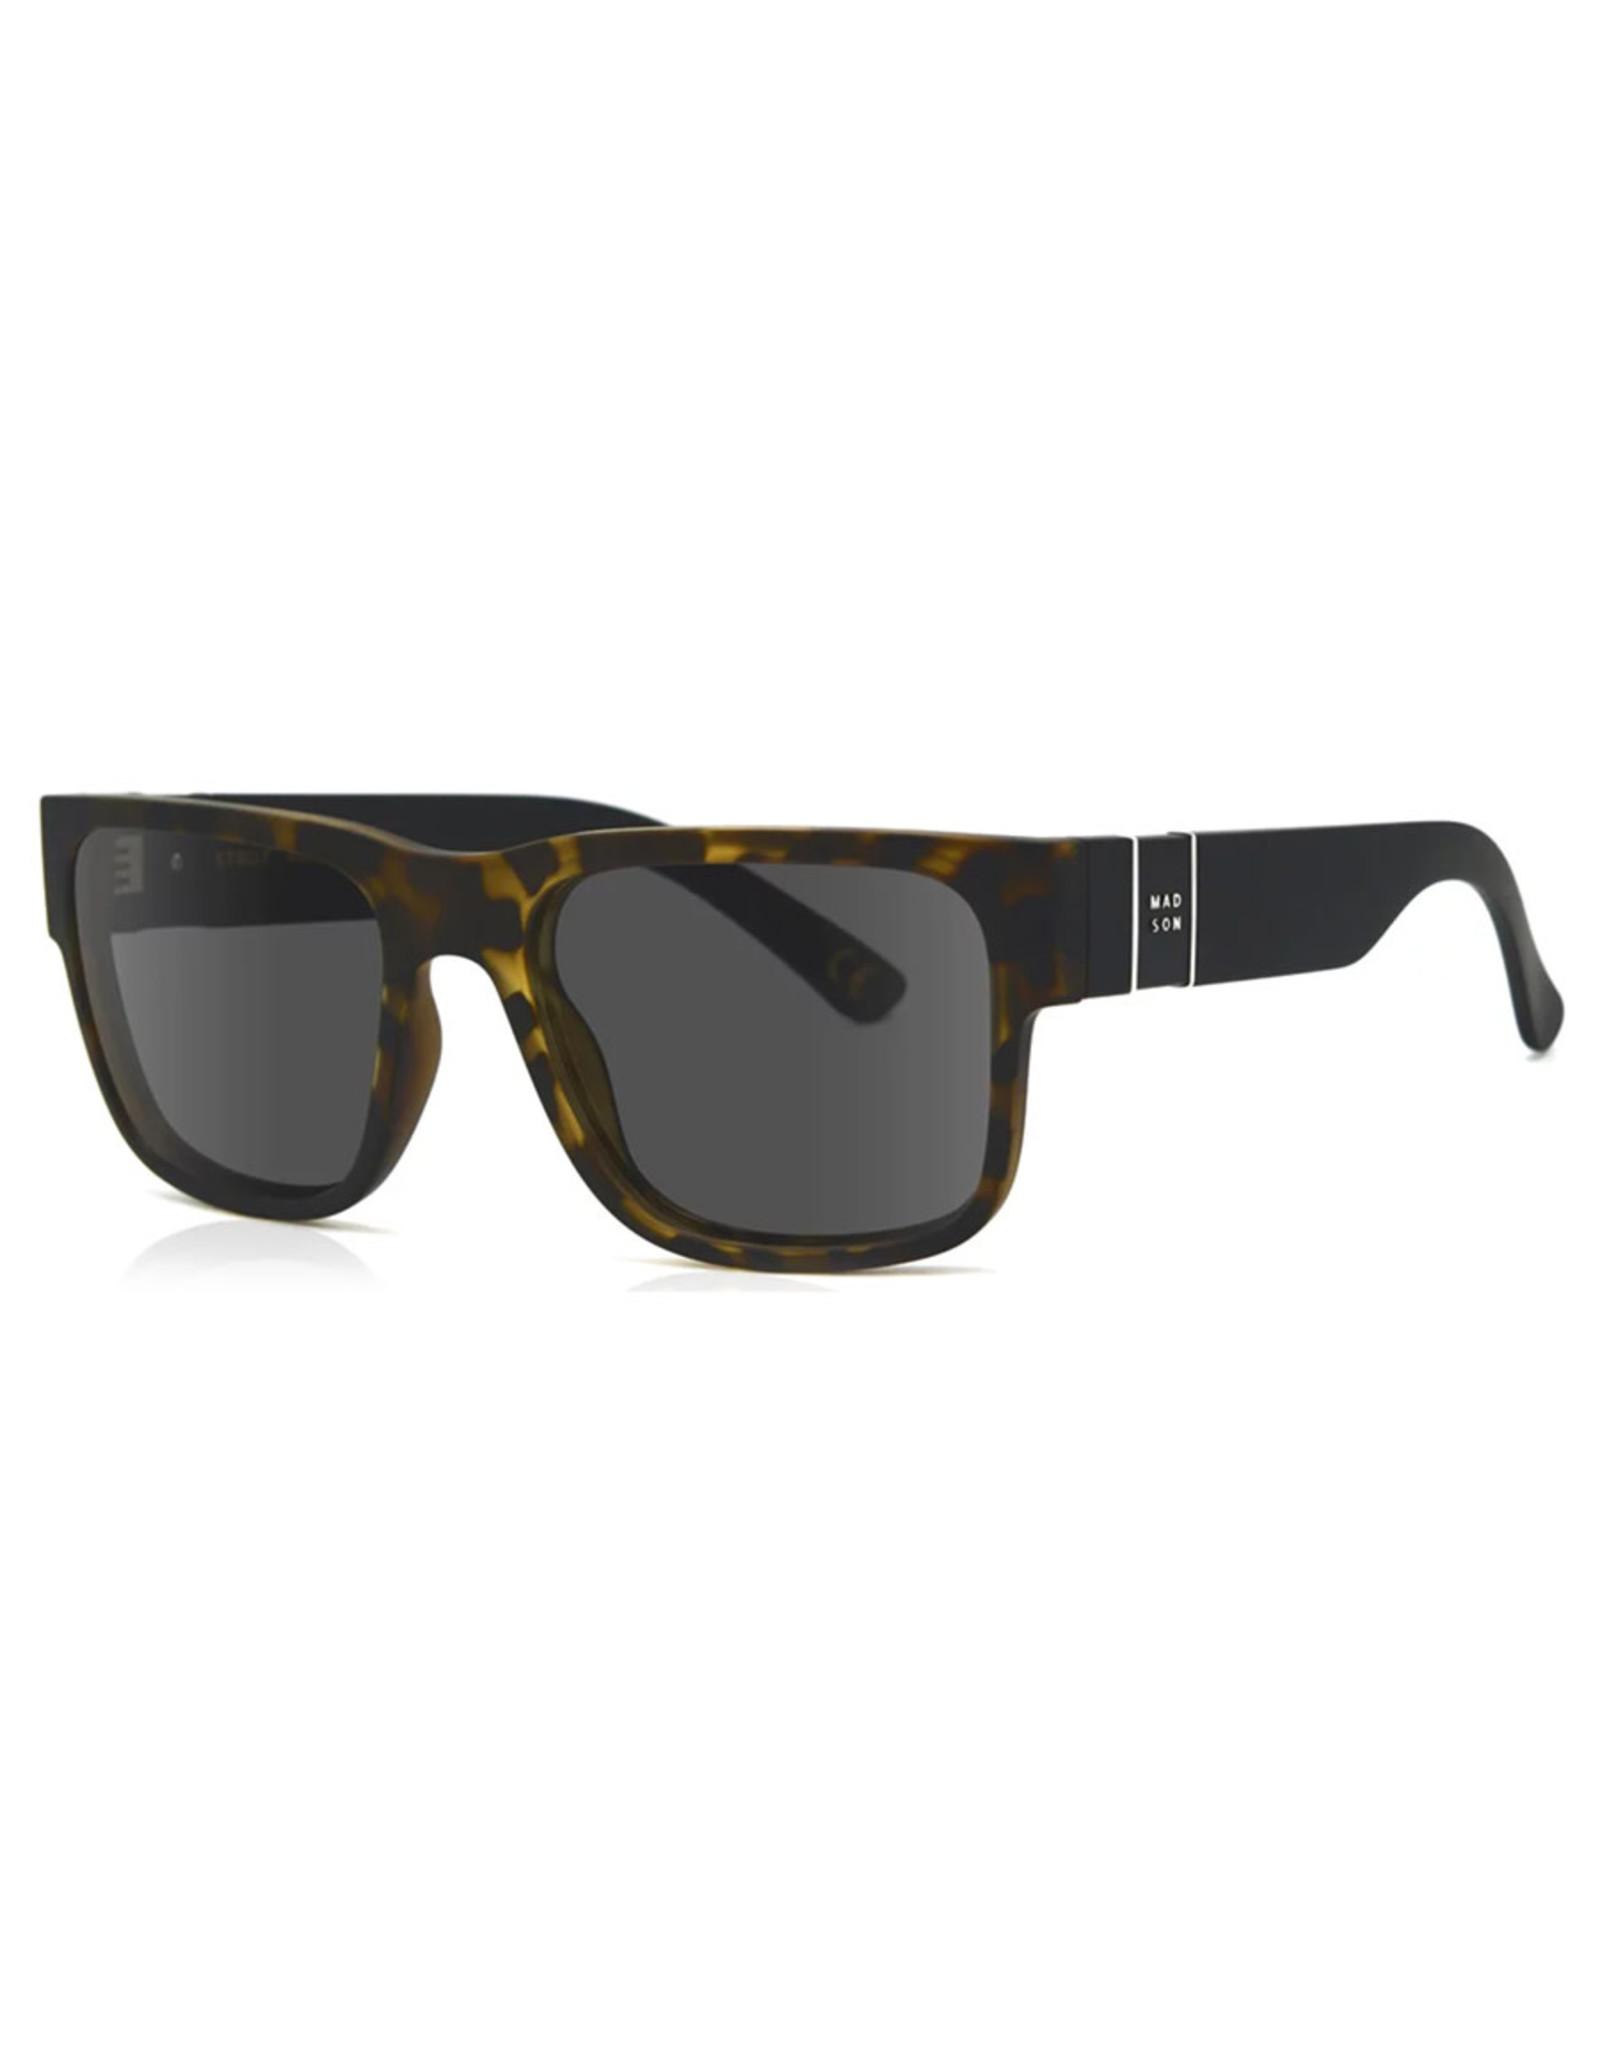 Madson Madson Sunglasses Strut (Black Tortoise Fade/Grey Polarized Lens)